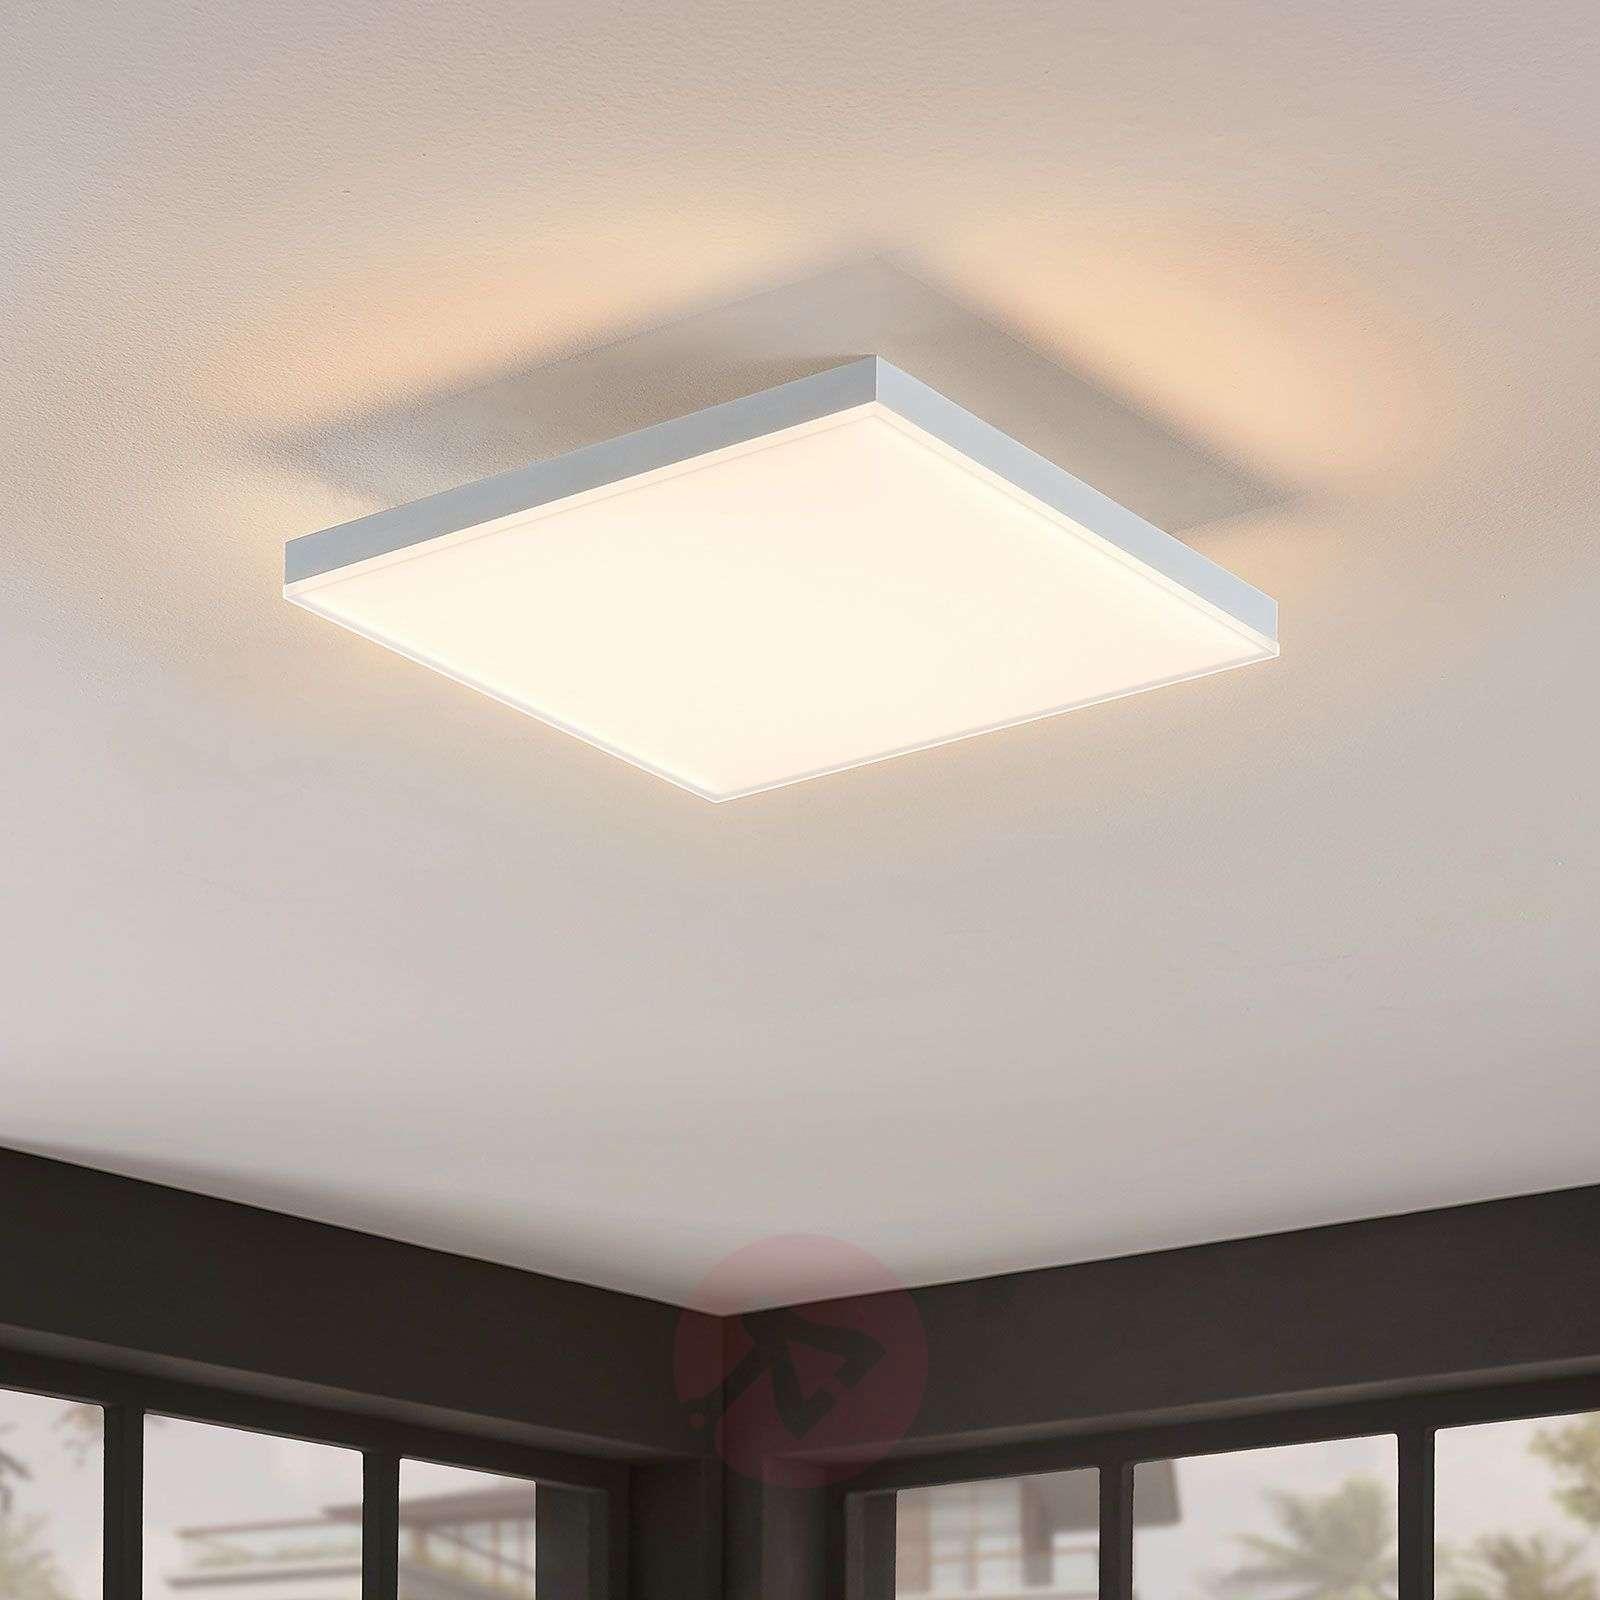 Blaan CCT LED panel with remote, 29.5 x 29.5 cm-9624326-01